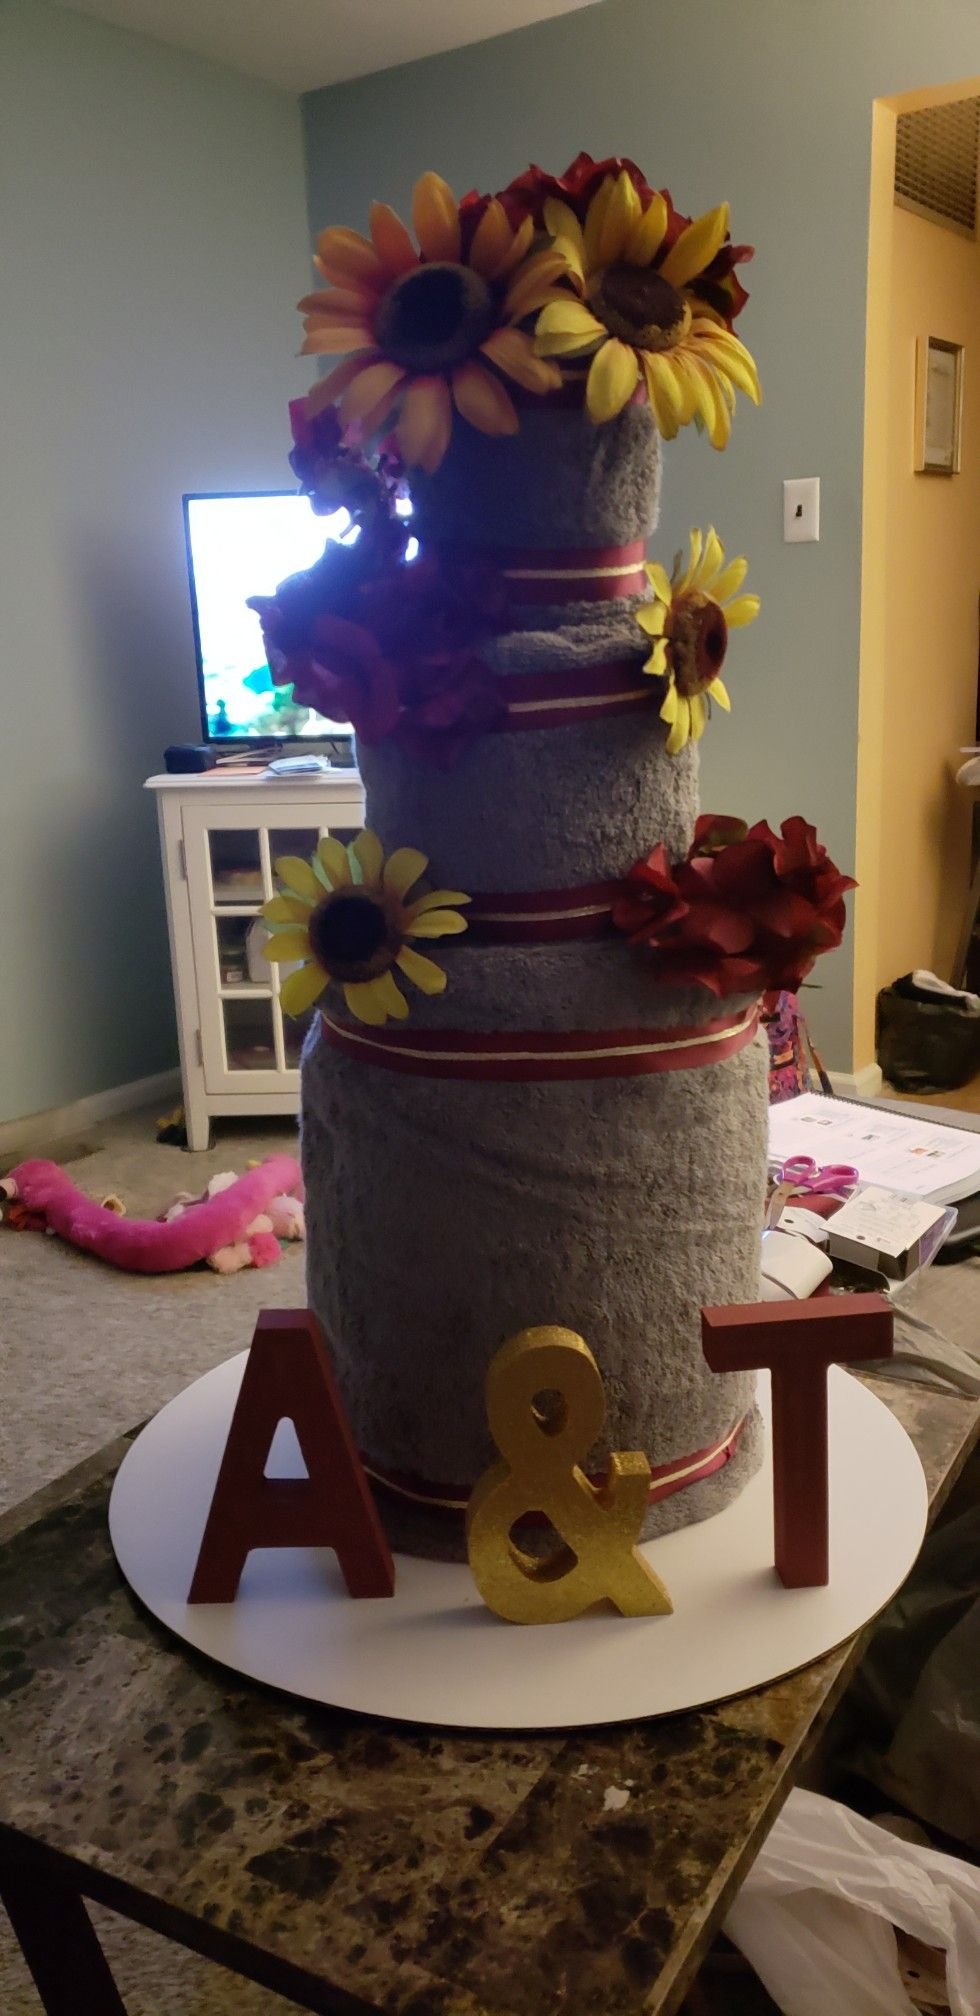 Pin By Aileen Bukowski On Wedding Towel Cakes - Pinterest